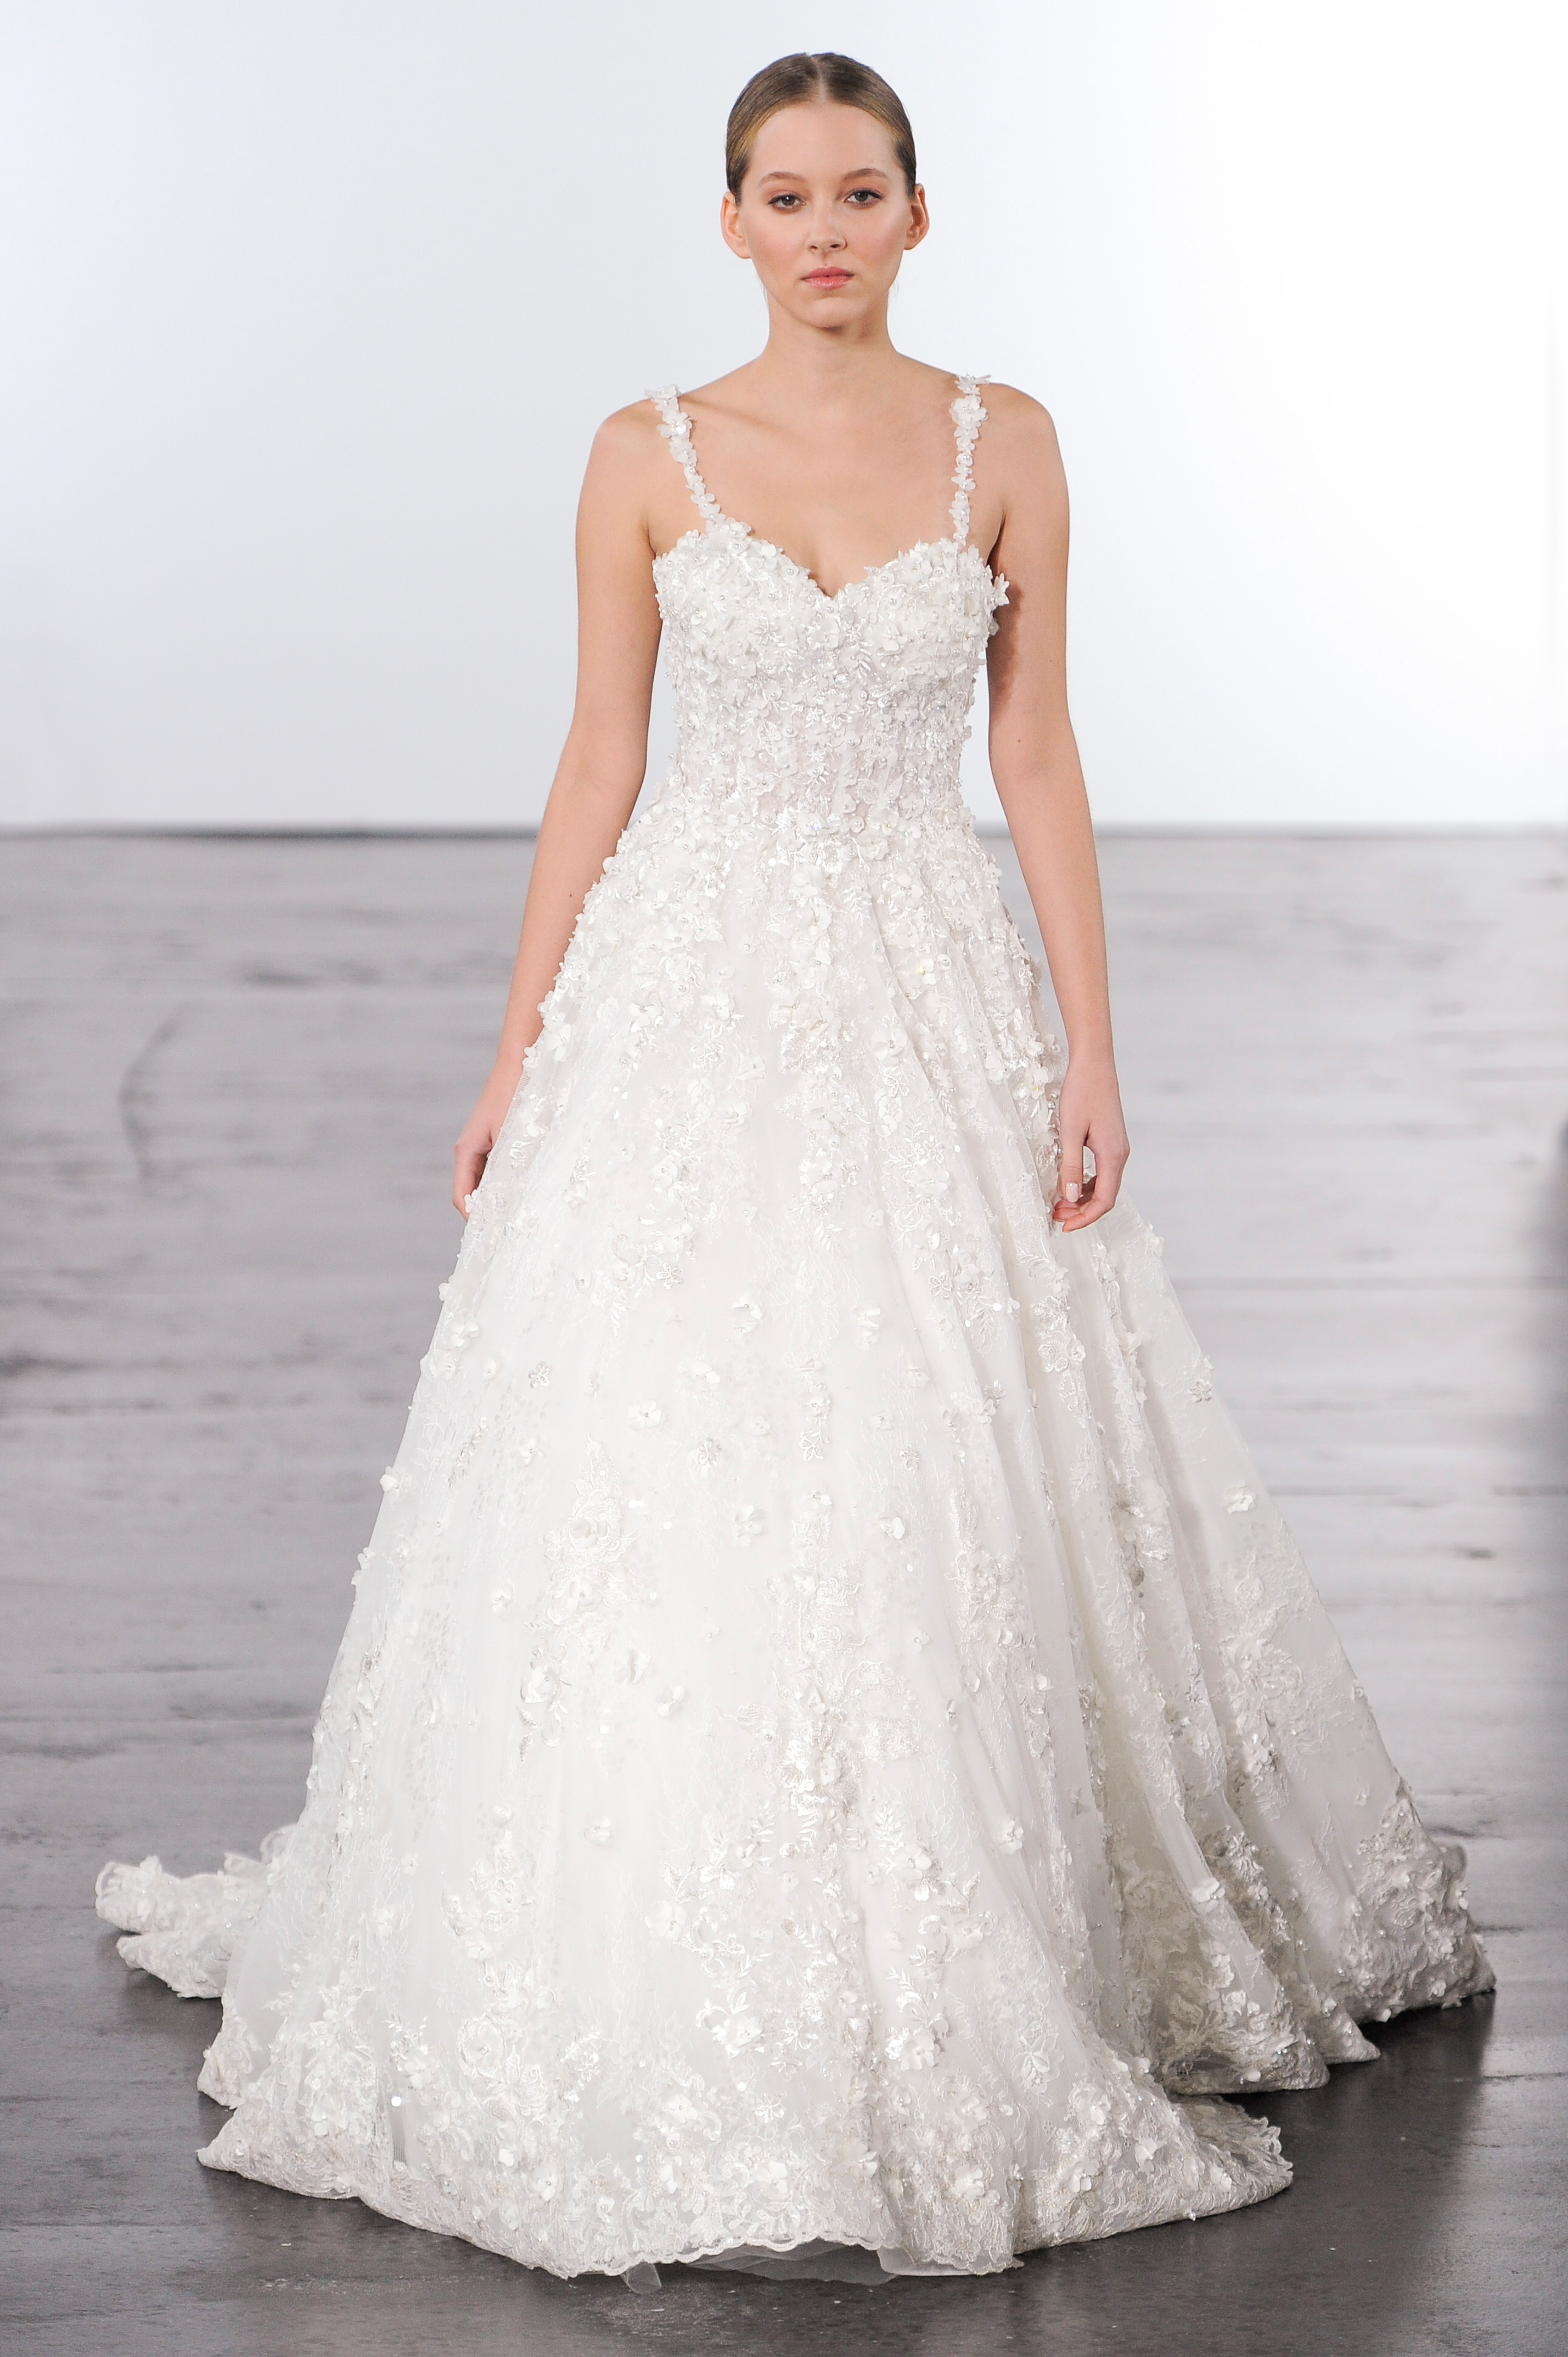 dennis basso spaghetti straps wedding dress with embellishments fall 2018